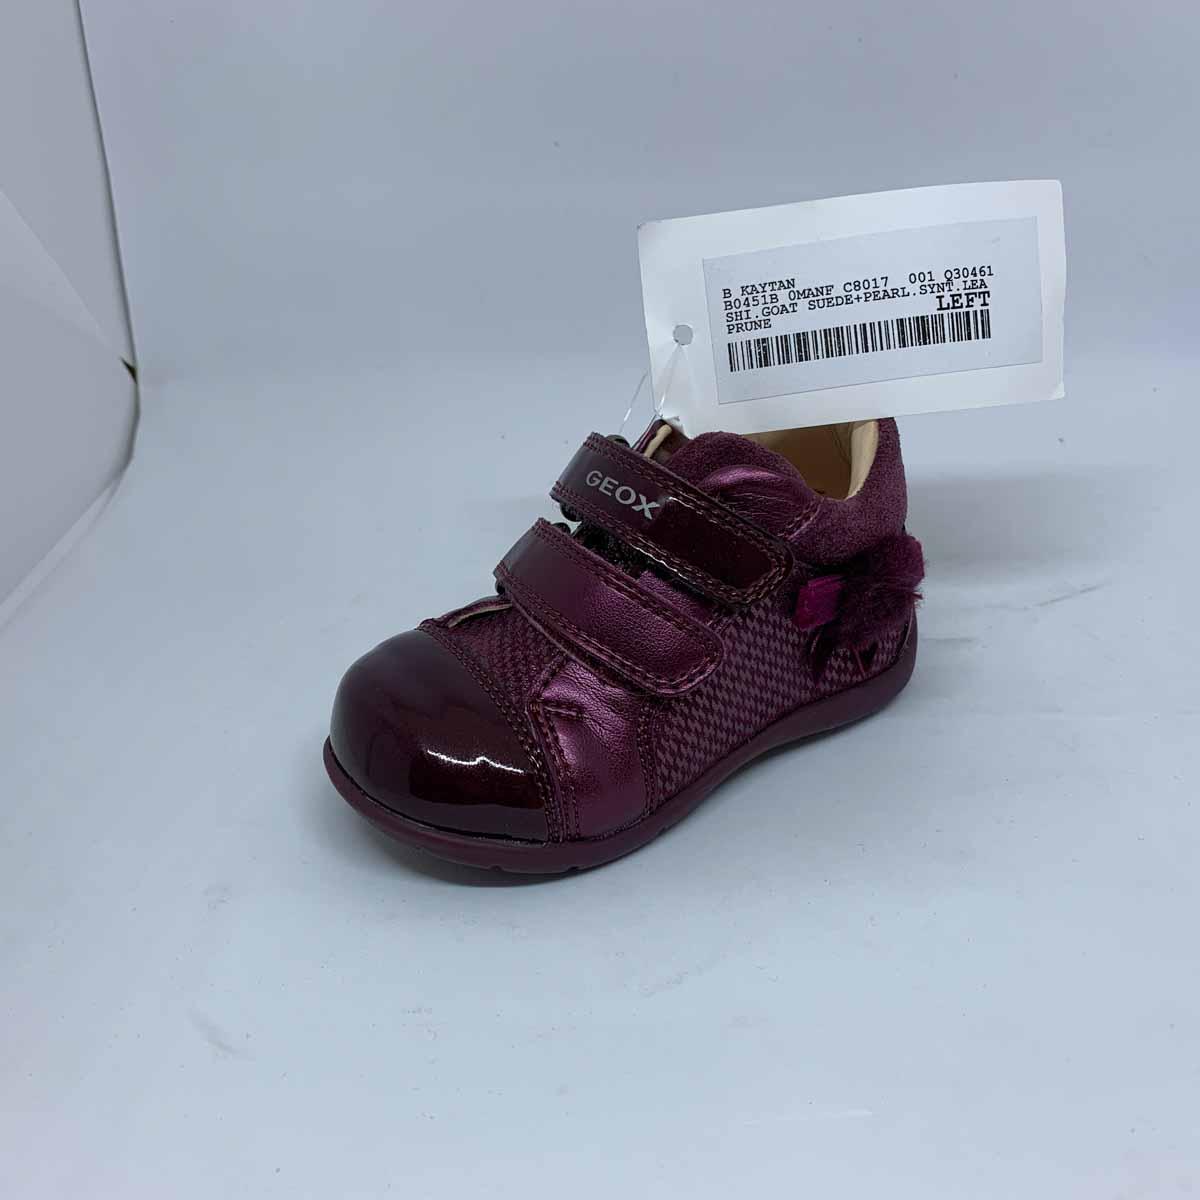 cayó Restricción Blanco  Geox Kaytan B0451B-C8017 Burgundy Infant Girls Boots